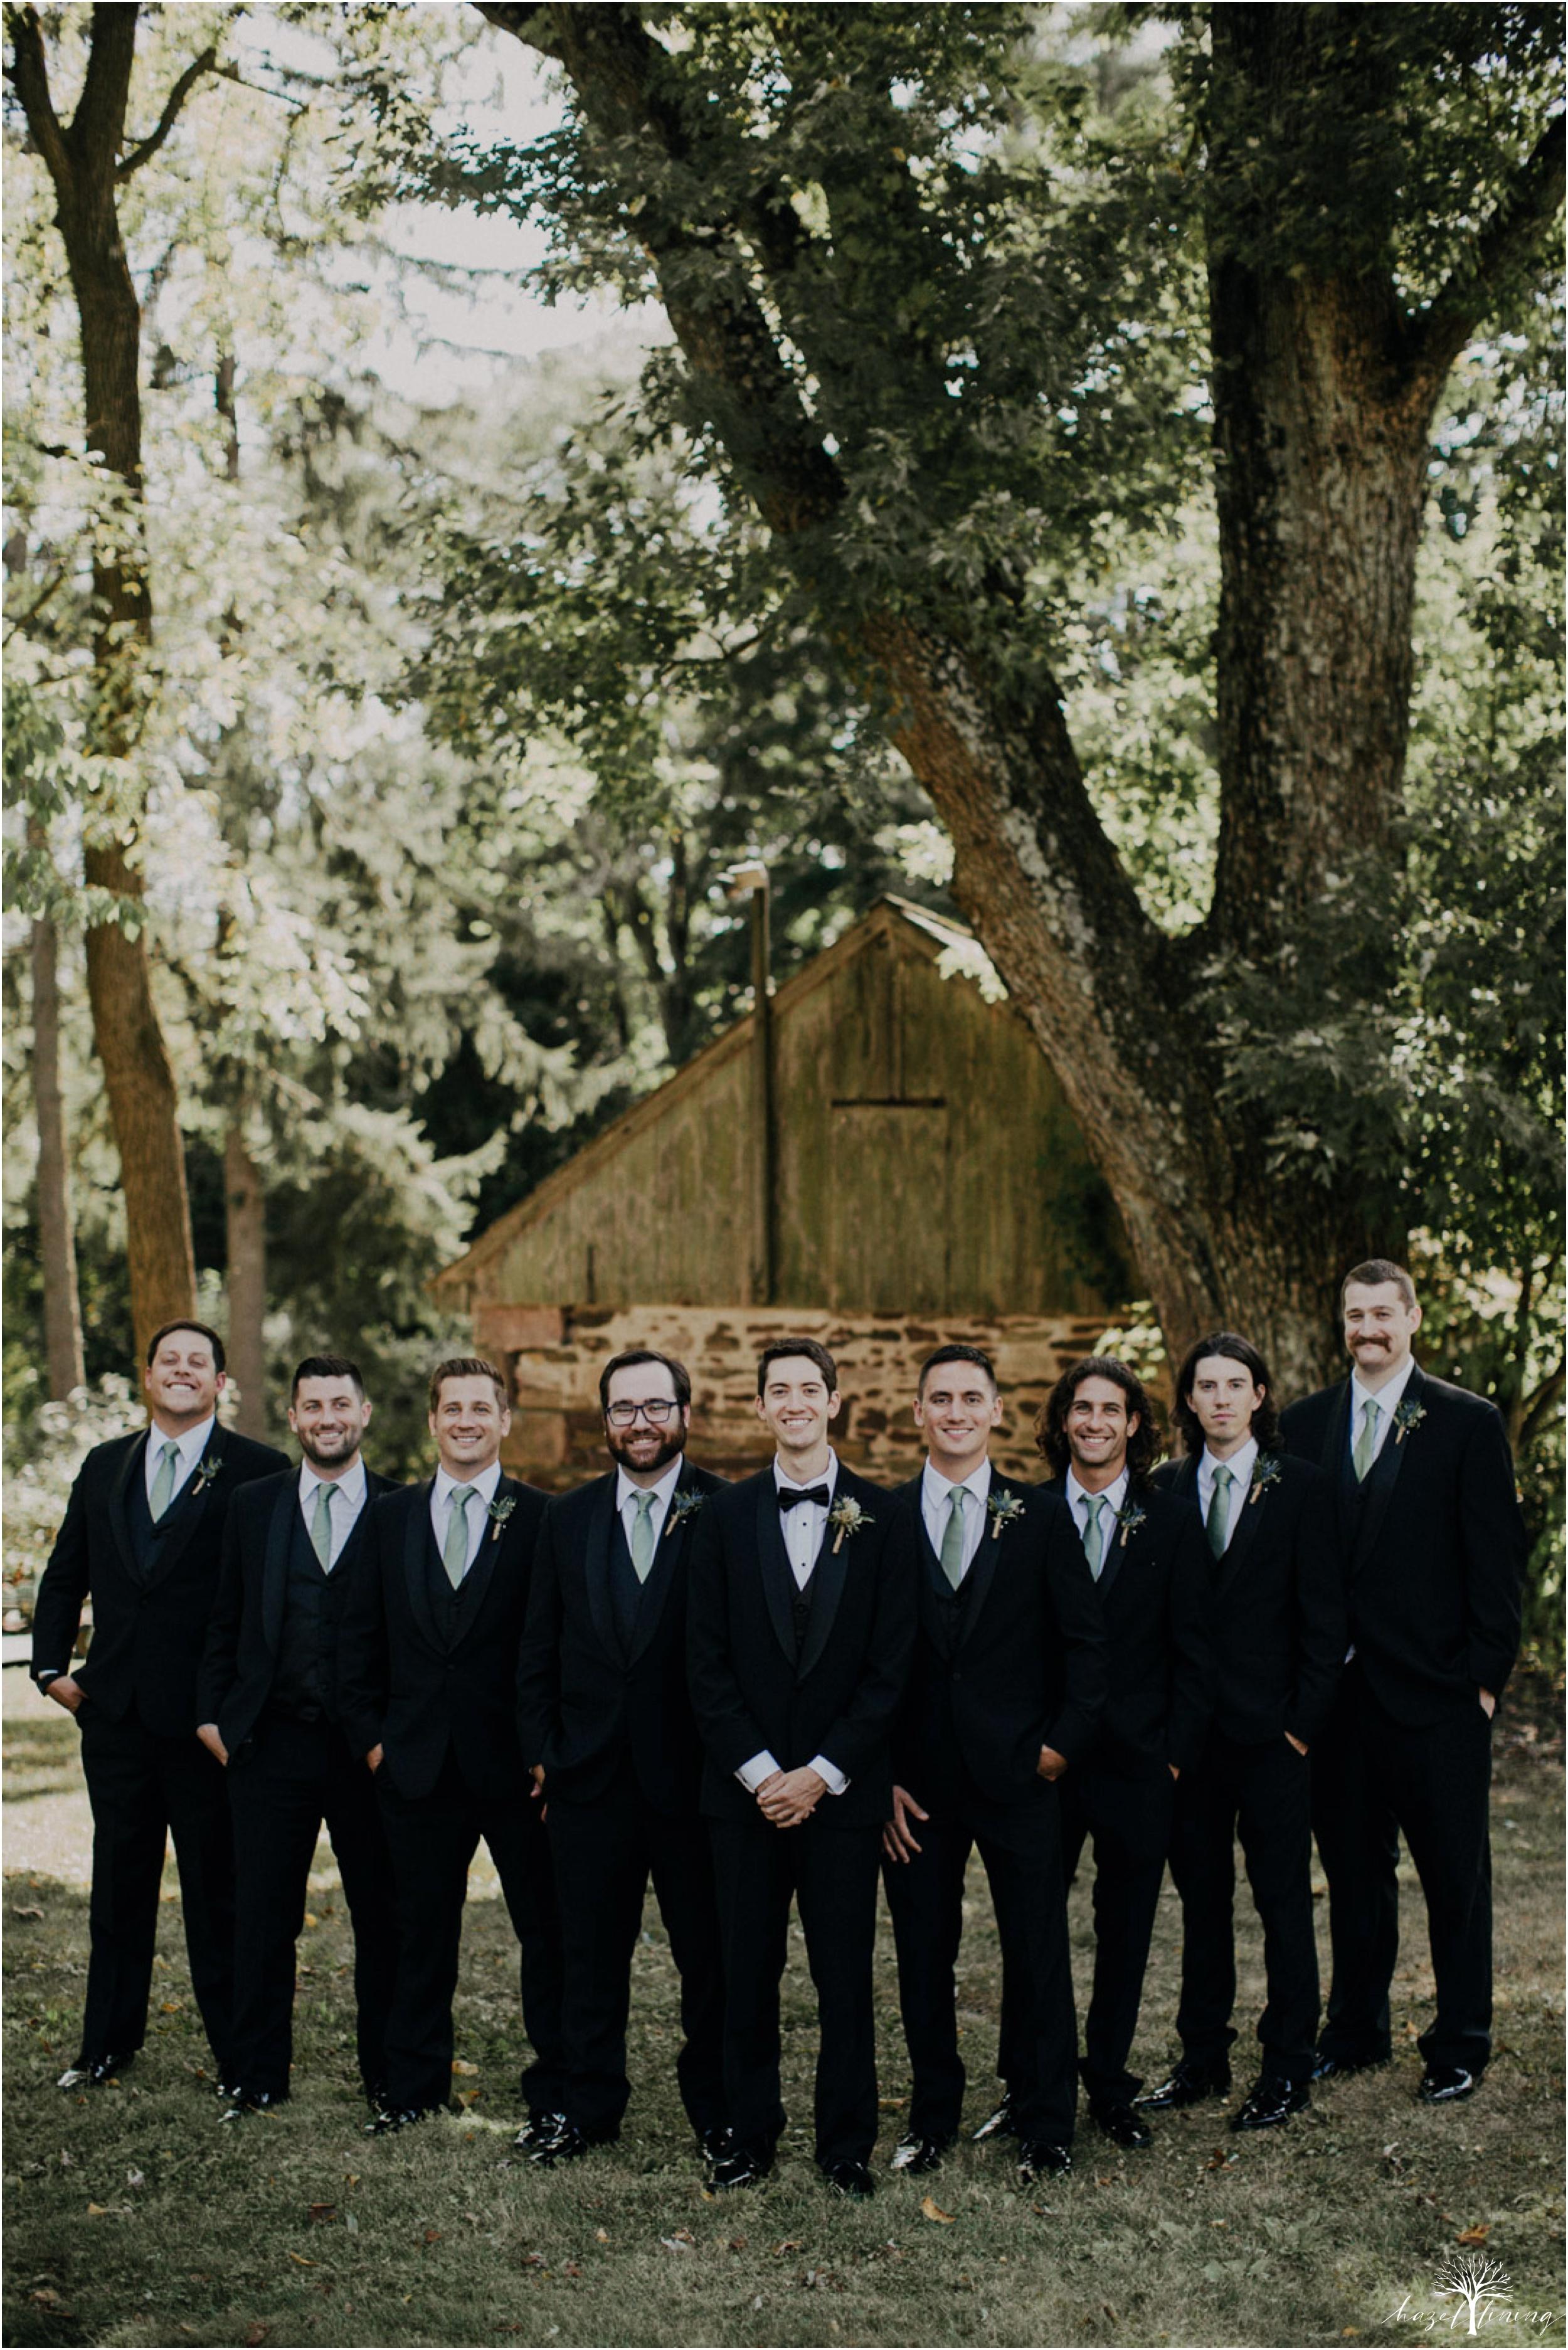 maureen-hepner-anthony-giordano-rose-bank-winery-newtow-pennsylvania-luxury-summer-wedding-hazel-lining-photography-destination-elopement-wedding-engagement-photography_0056.jpg